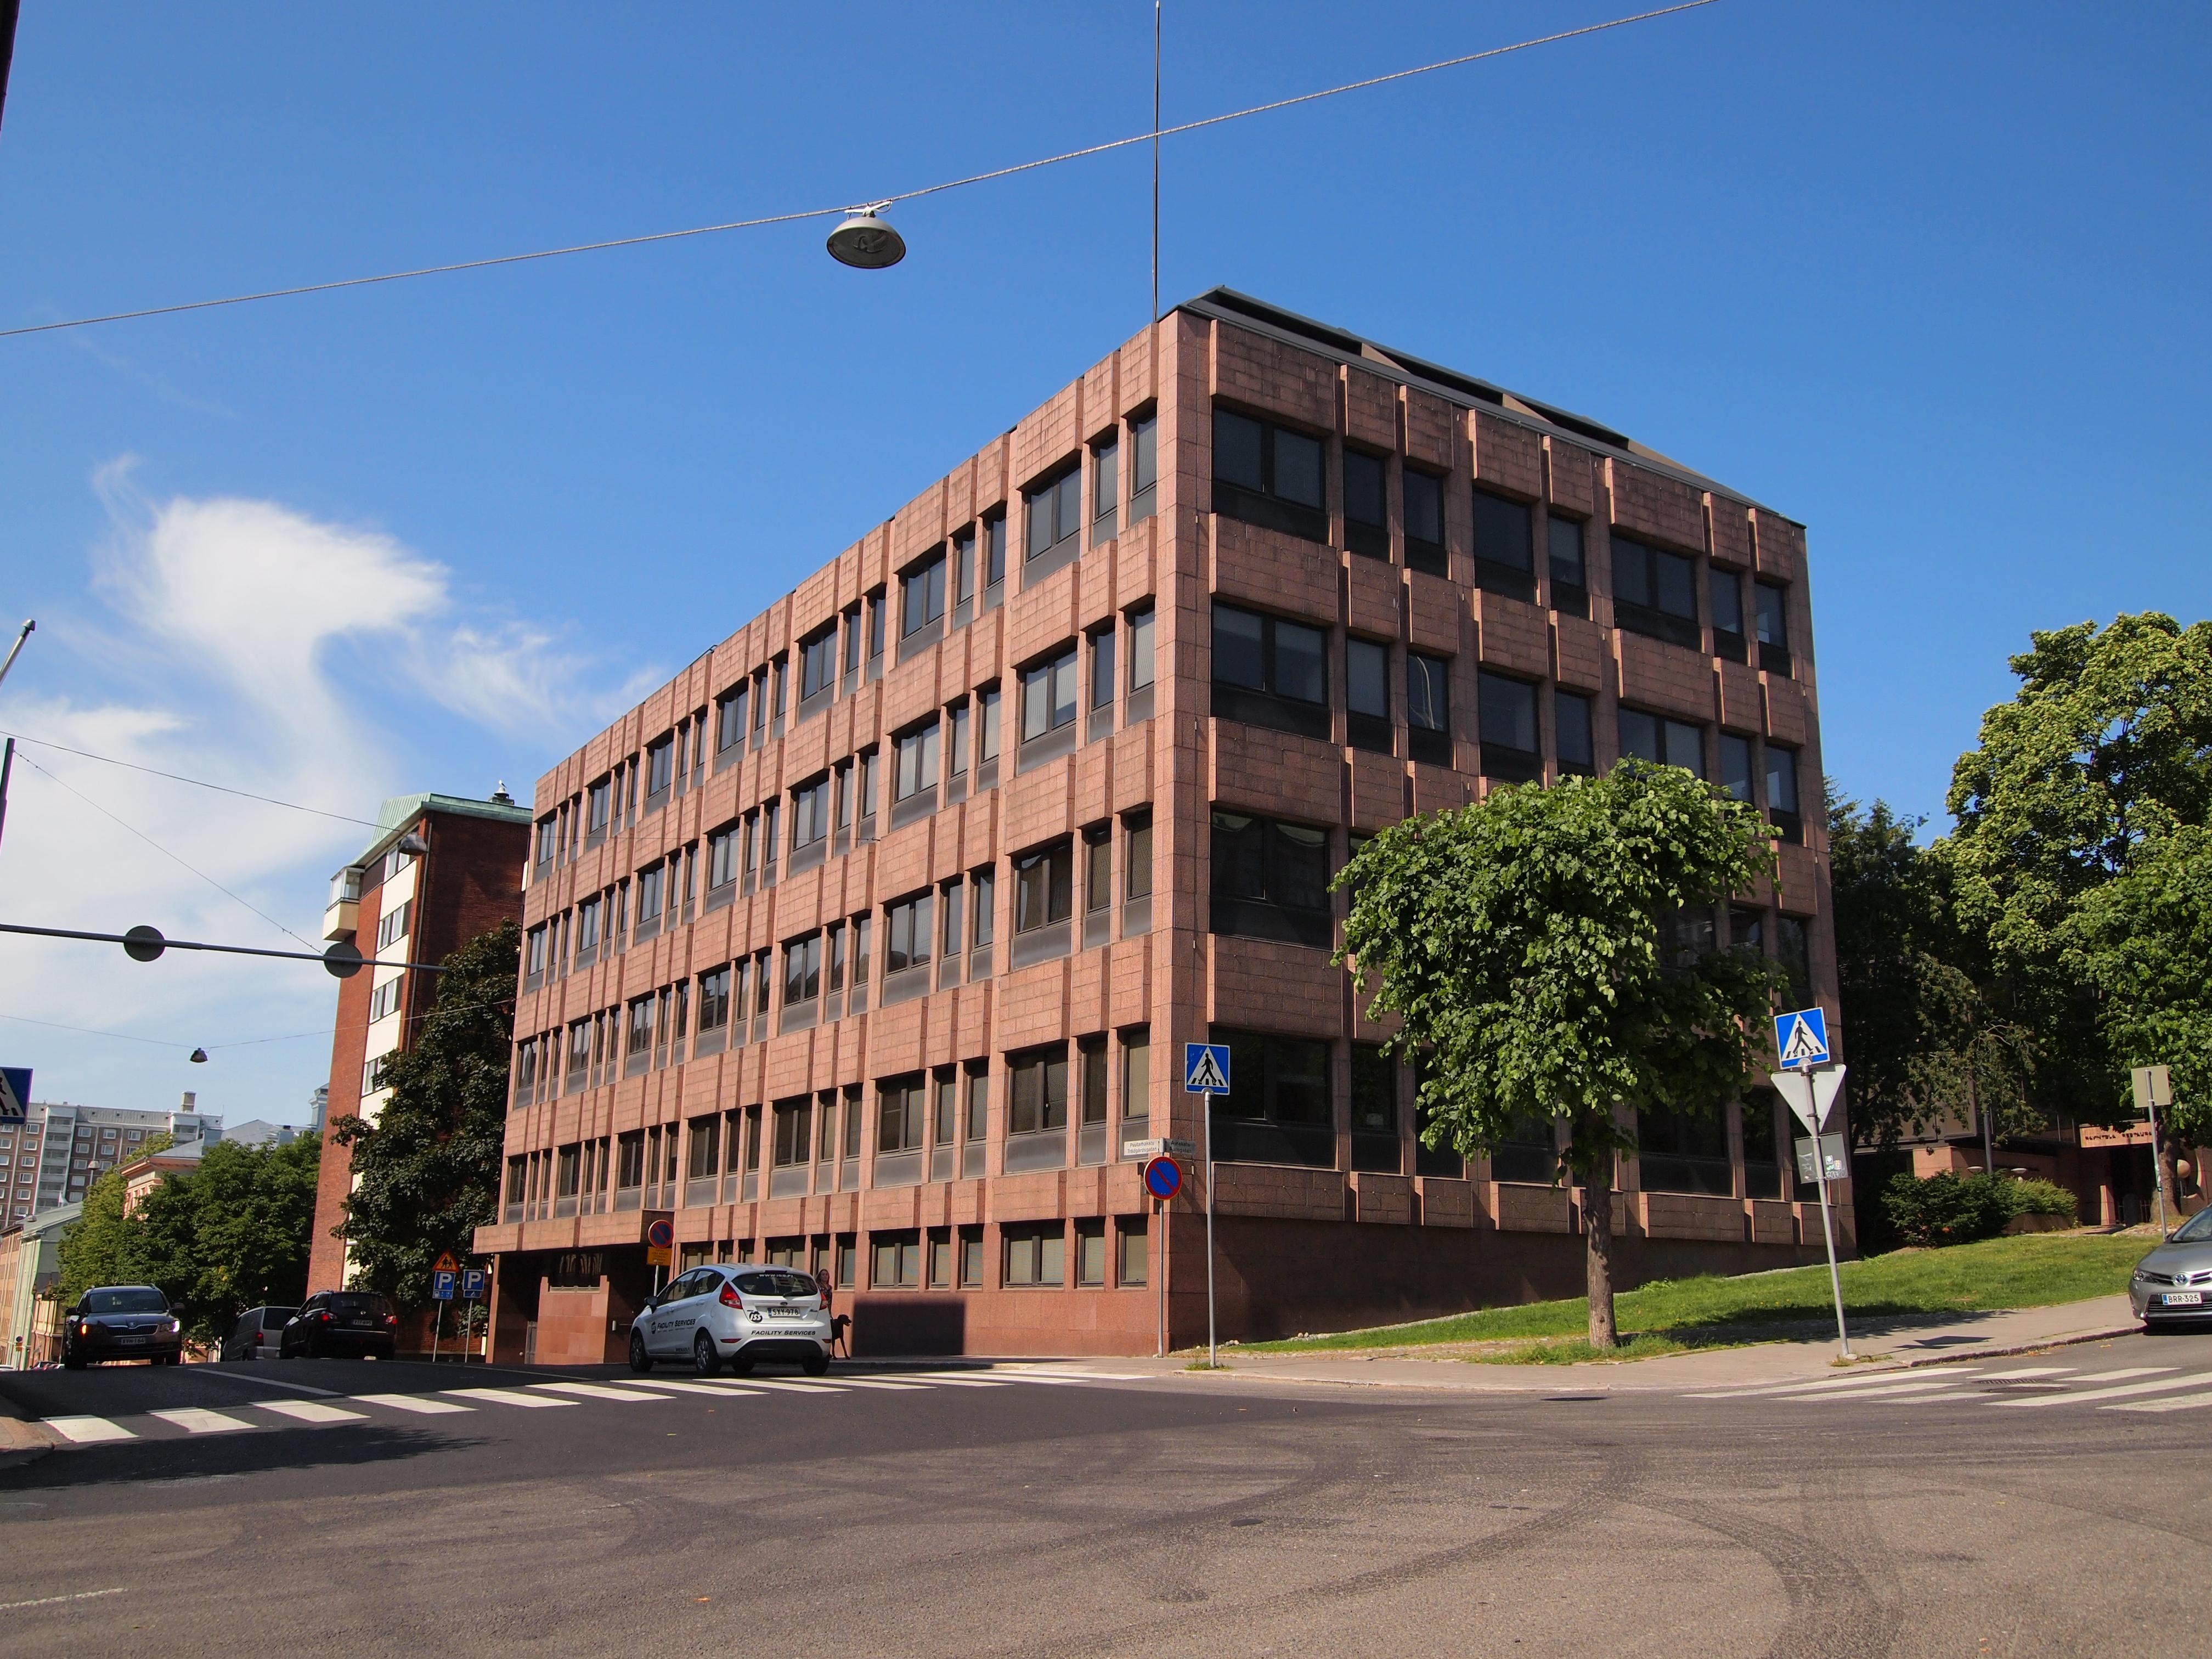 Puutarhakatu Turku Wikipedia